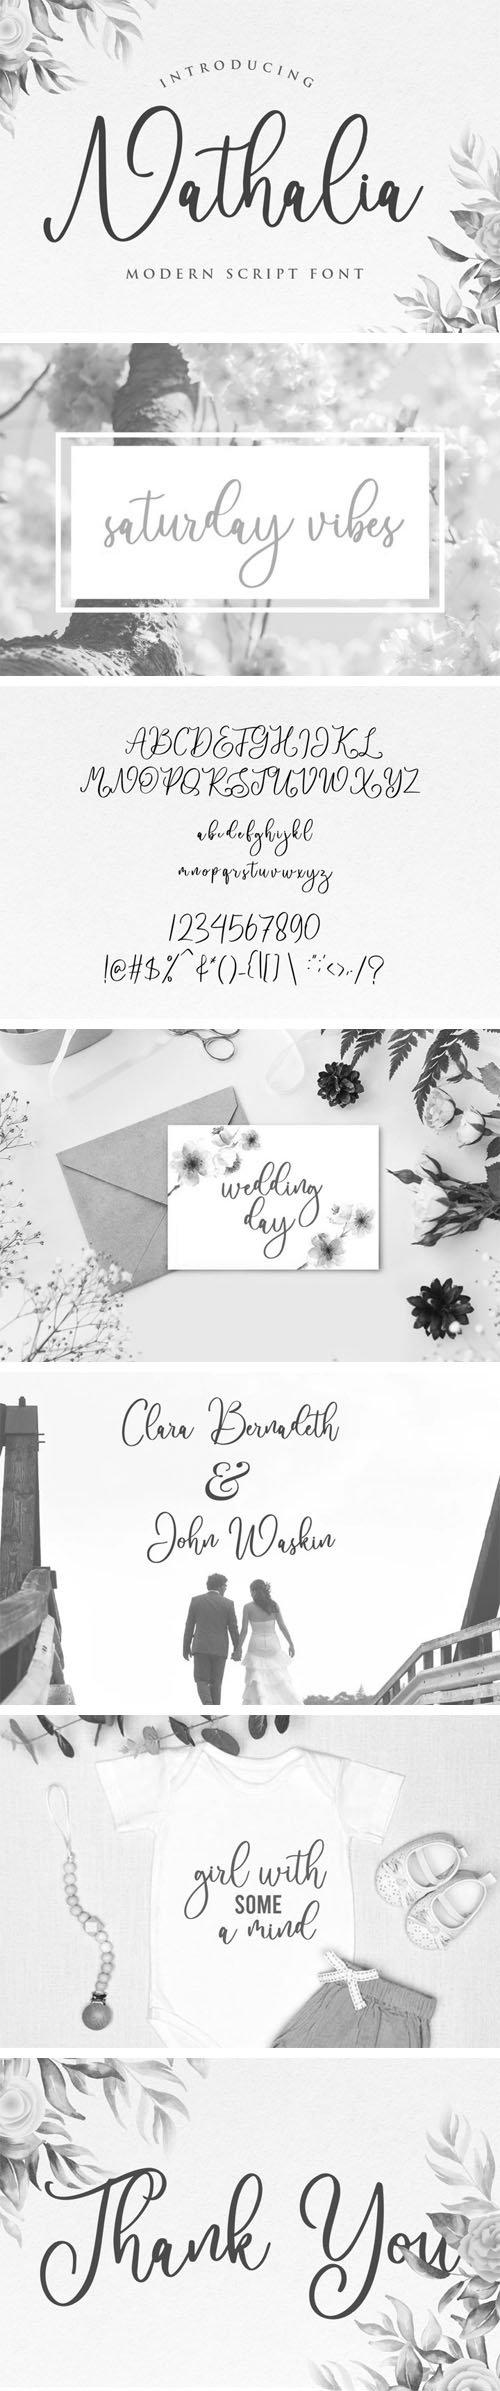 Nathalia - Modern Handwritten Font